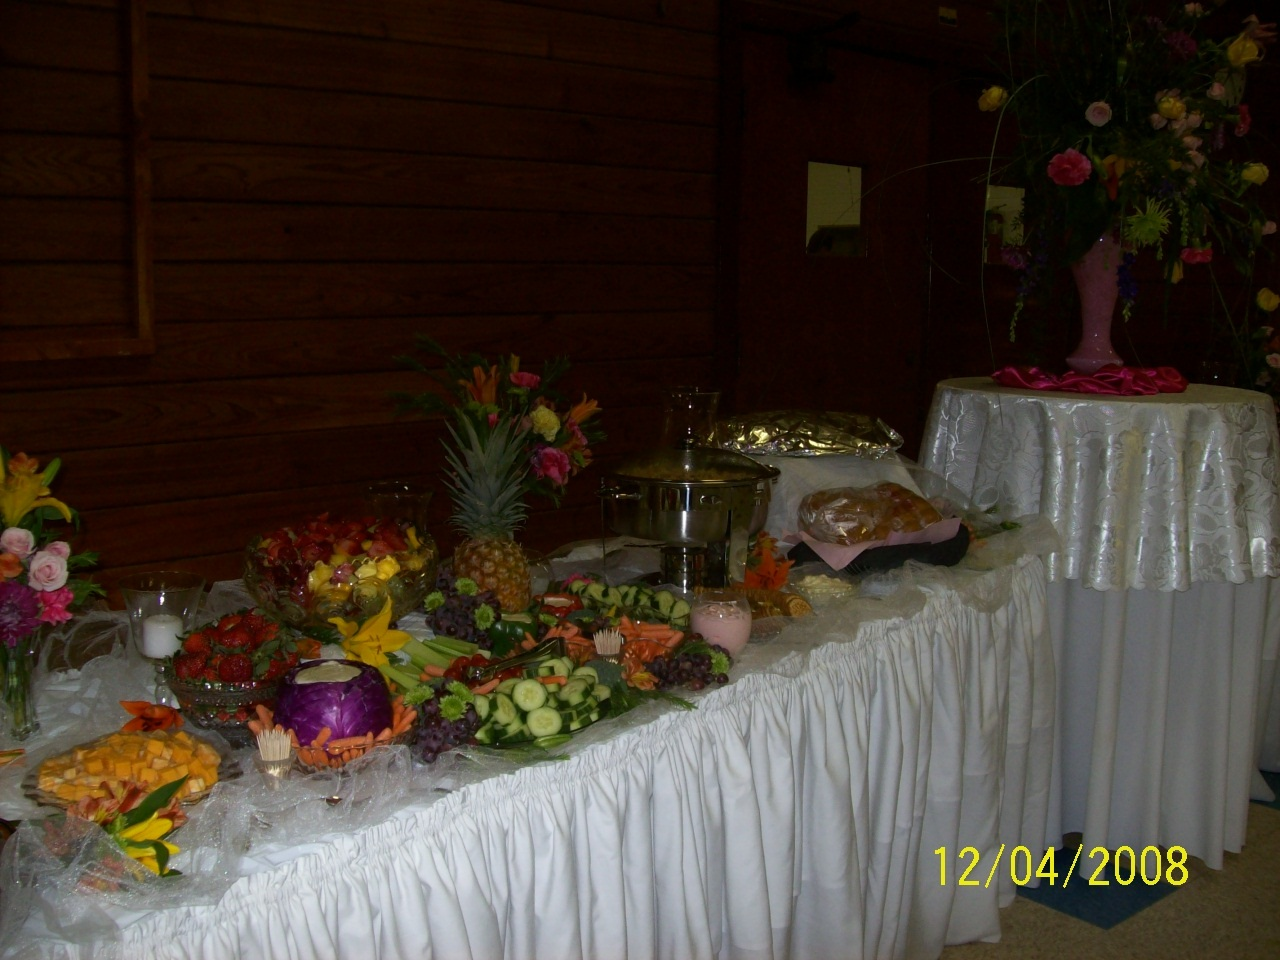 Reception, Flowers & Decor, Food, Table, Buffet